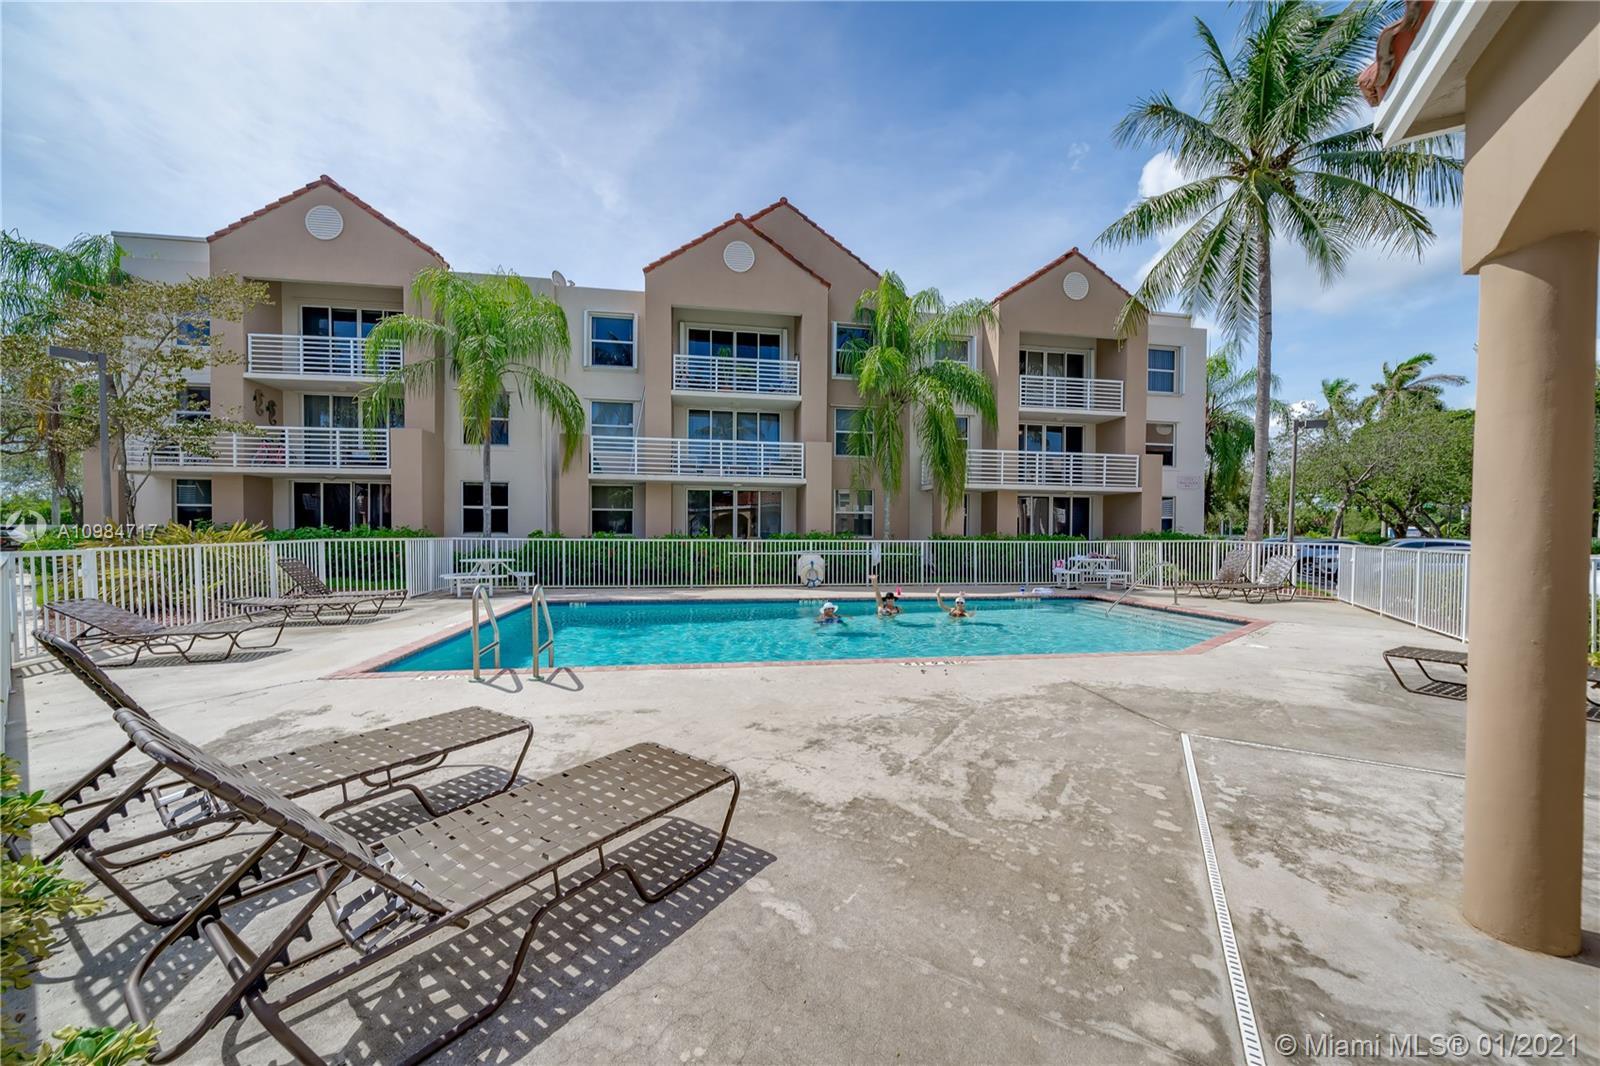 2711 Ocean Club Blvd # 207, Hollywood, Florida 33019, 2 Bedrooms Bedrooms, ,2 BathroomsBathrooms,Residential Lease,For Rent,2711 Ocean Club Blvd # 207,A10984717